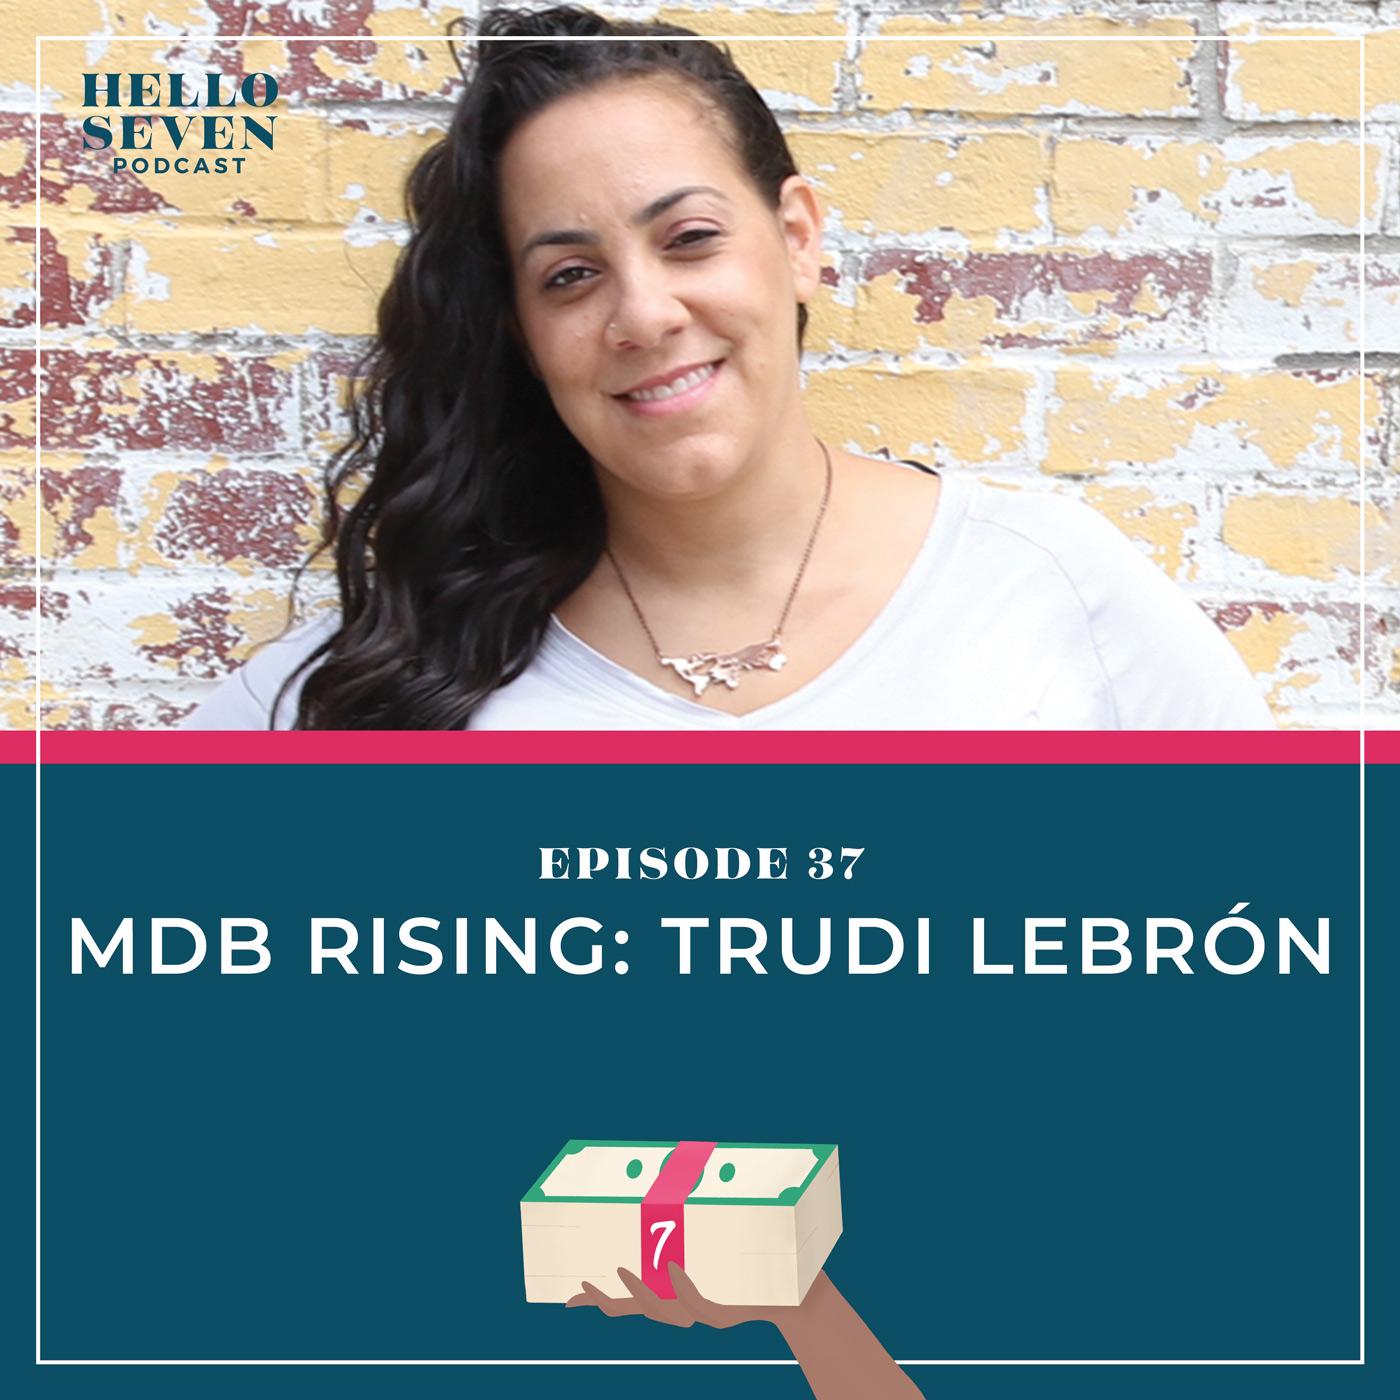 MDB Rising: Trudi Lebrón